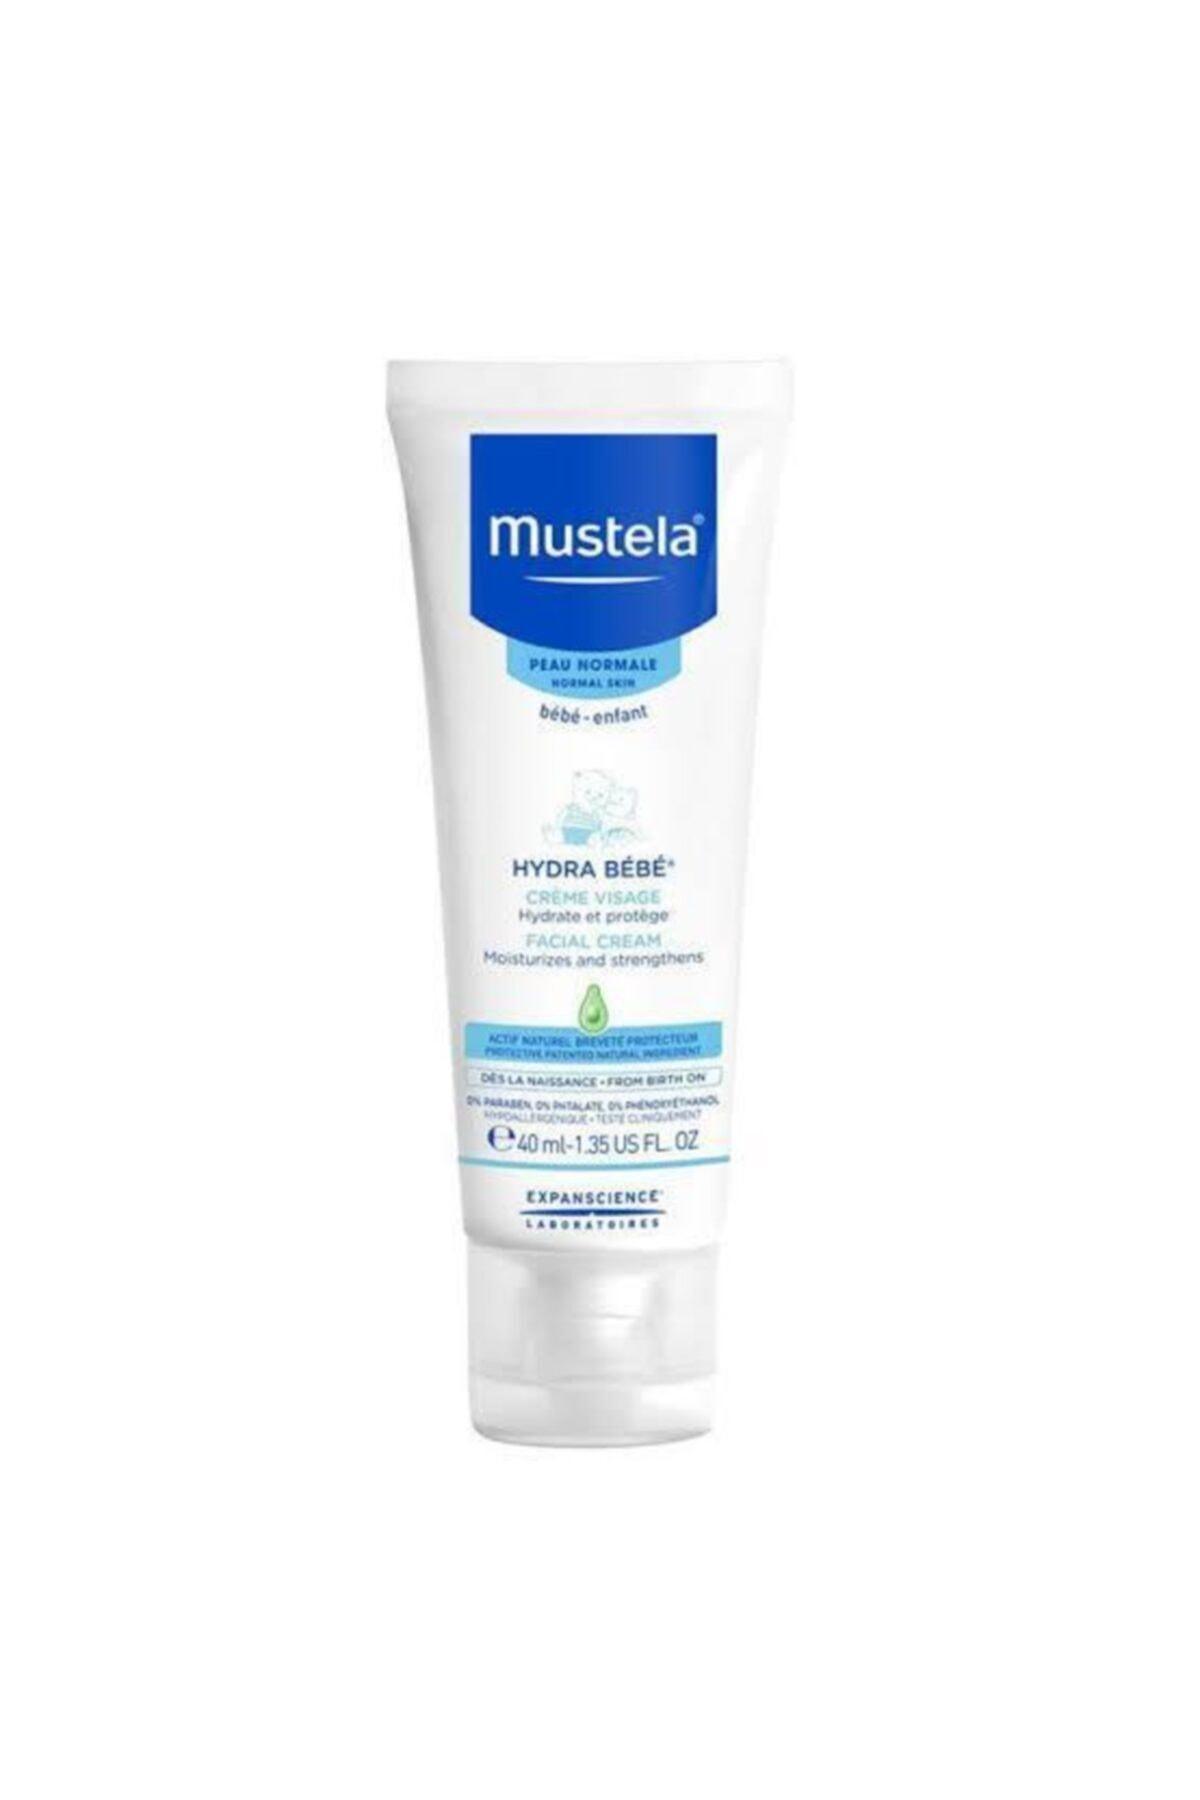 Mustela Hydra Bebe Face Cream Yüz Kremi 40 Ml 1